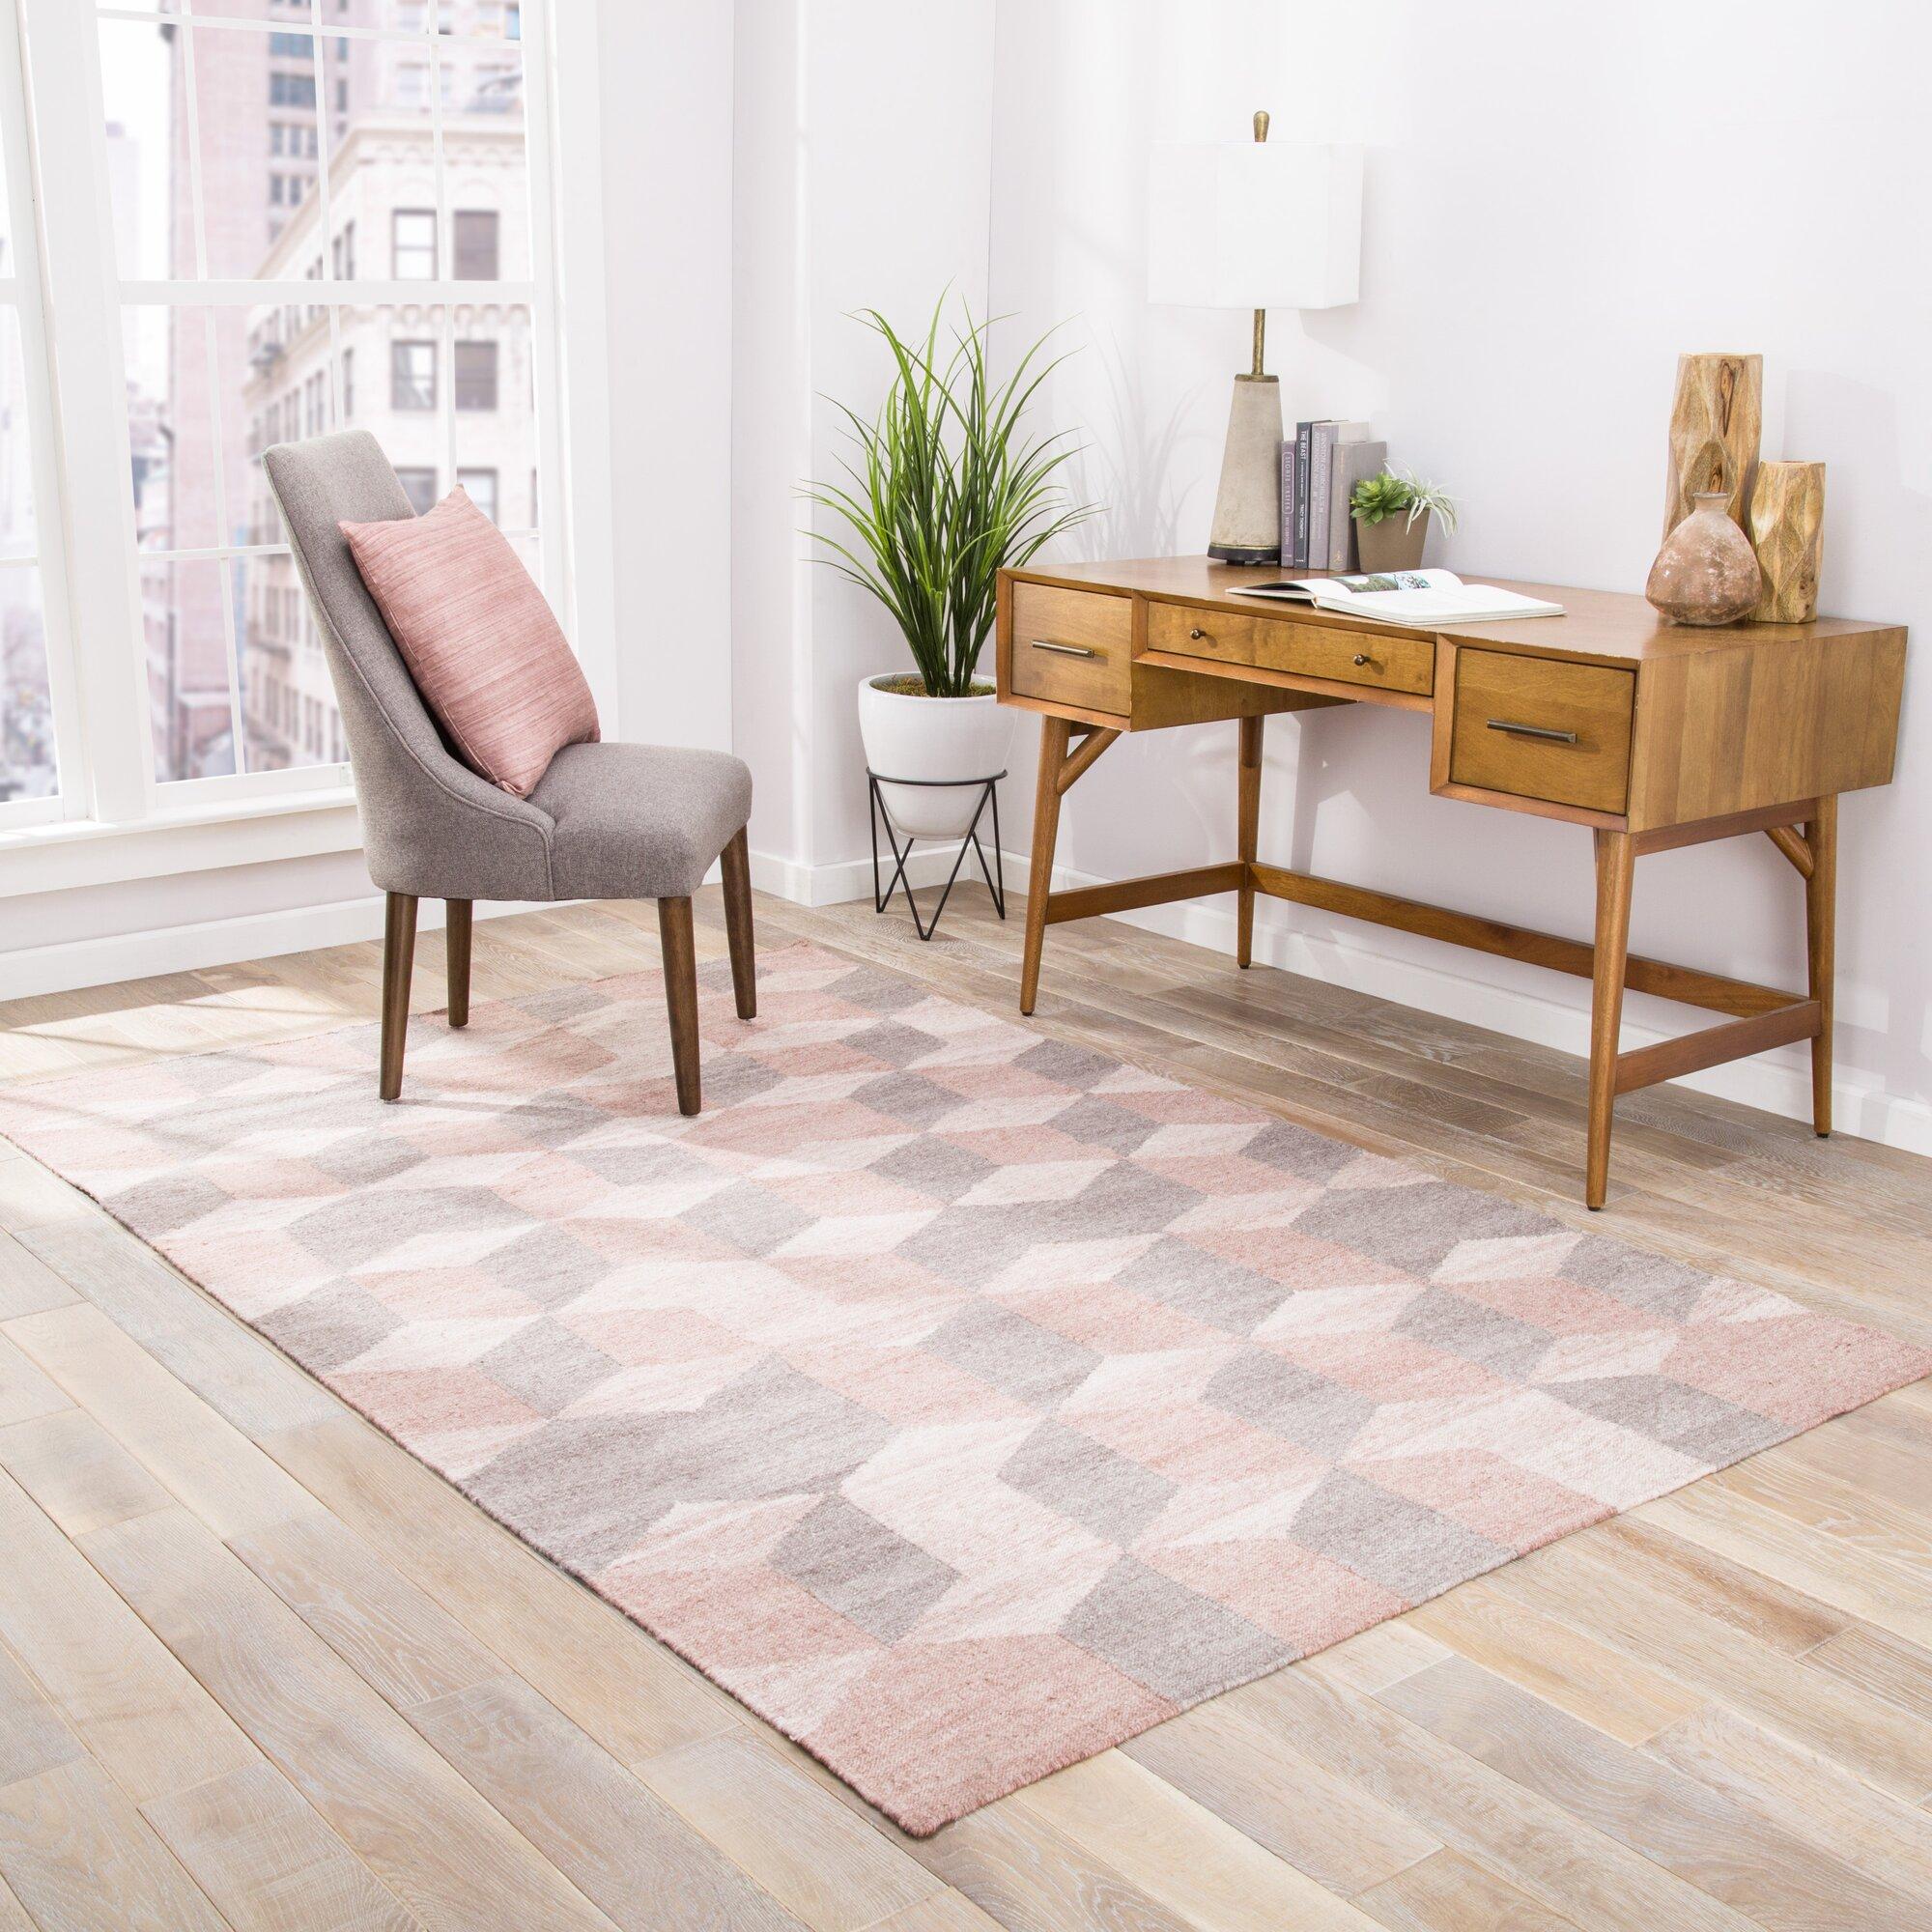 Outdoor Laminate Flooring laminate flooring outdoor use Magnifying Glass